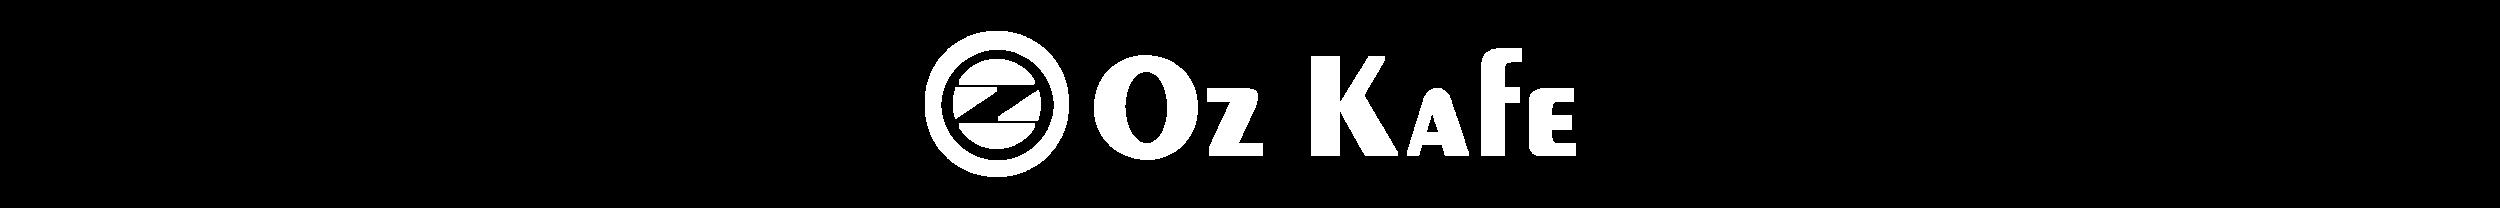 OZKafeLogo-footer-07.png